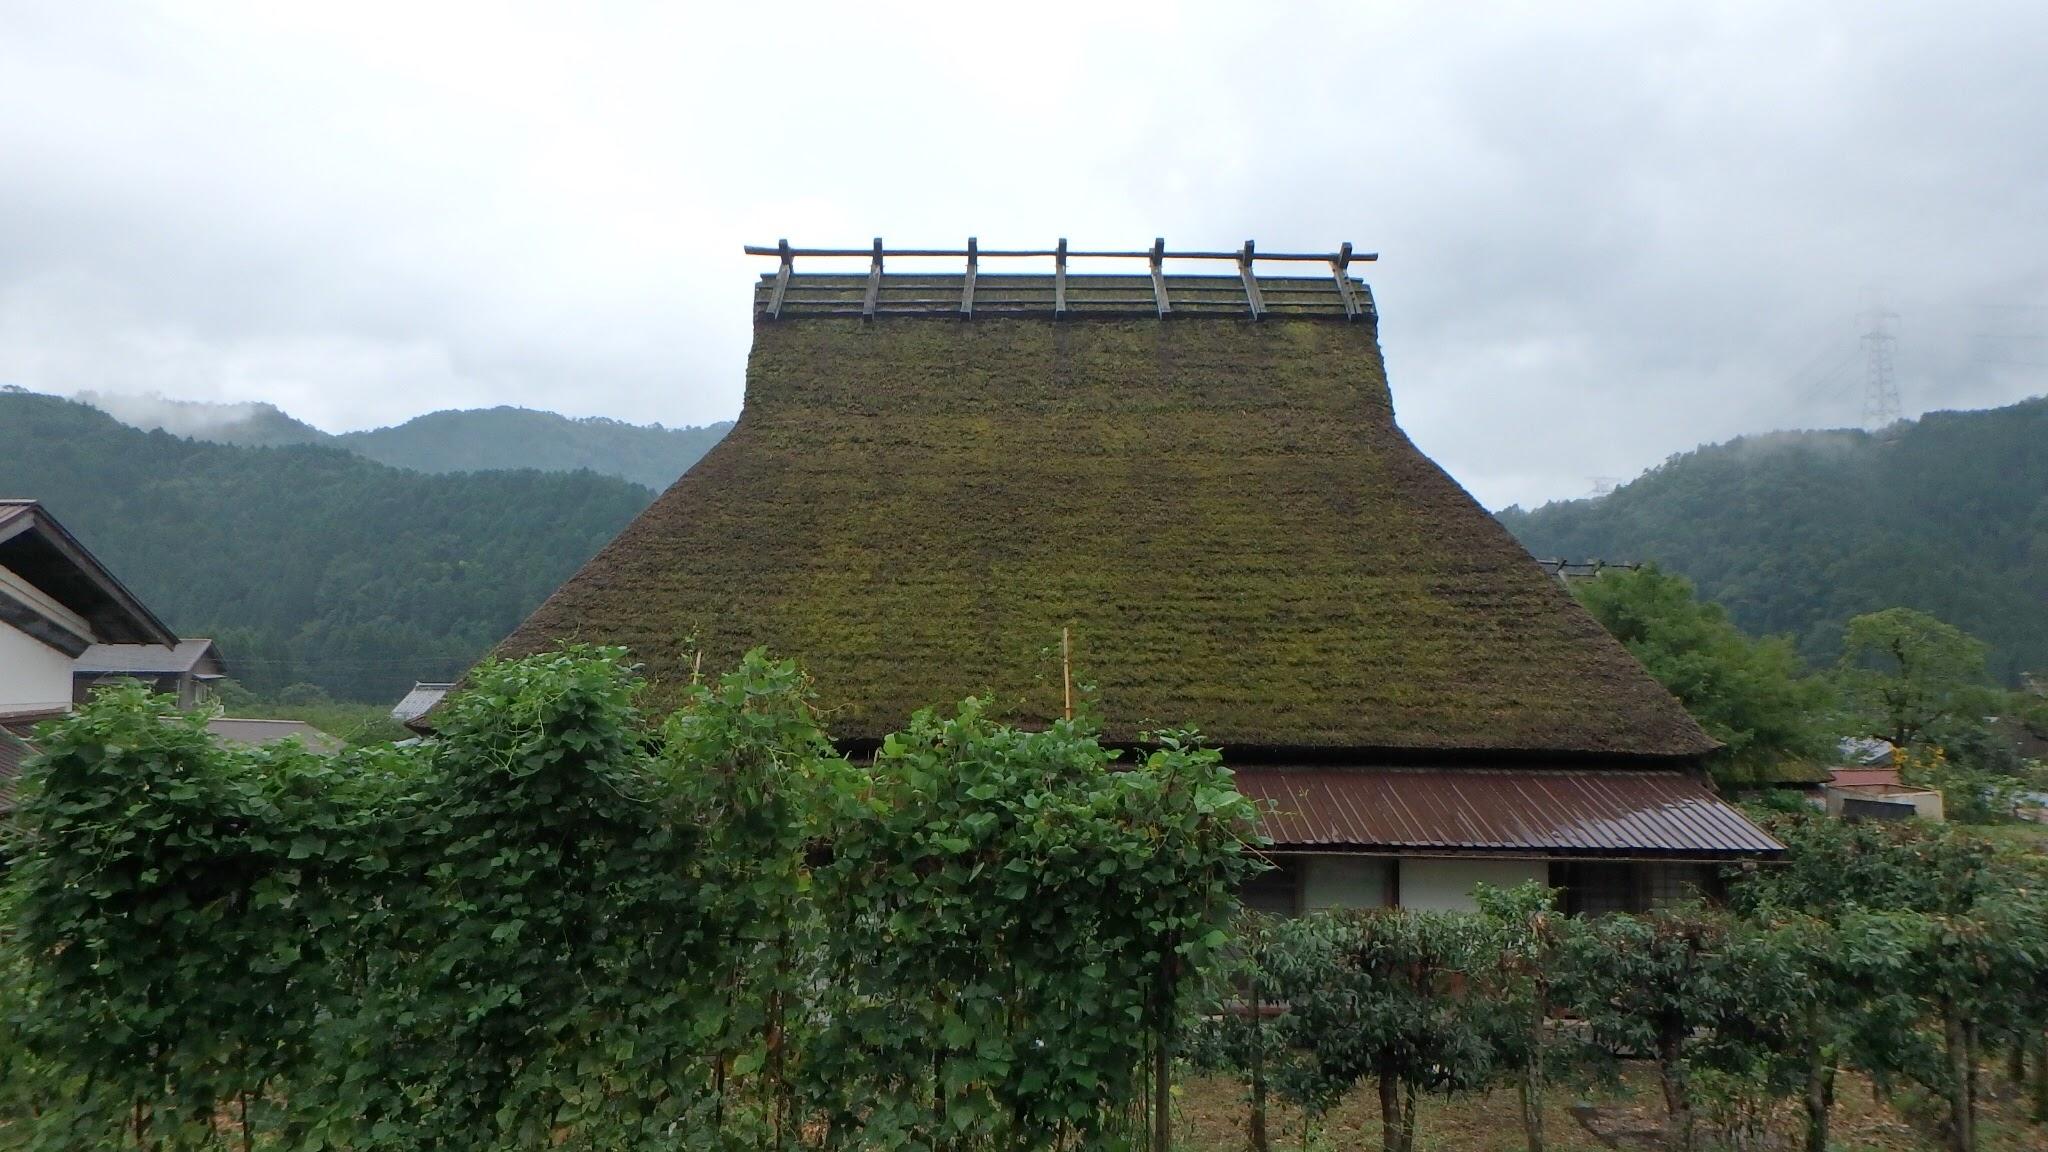 Miyama traditional roof